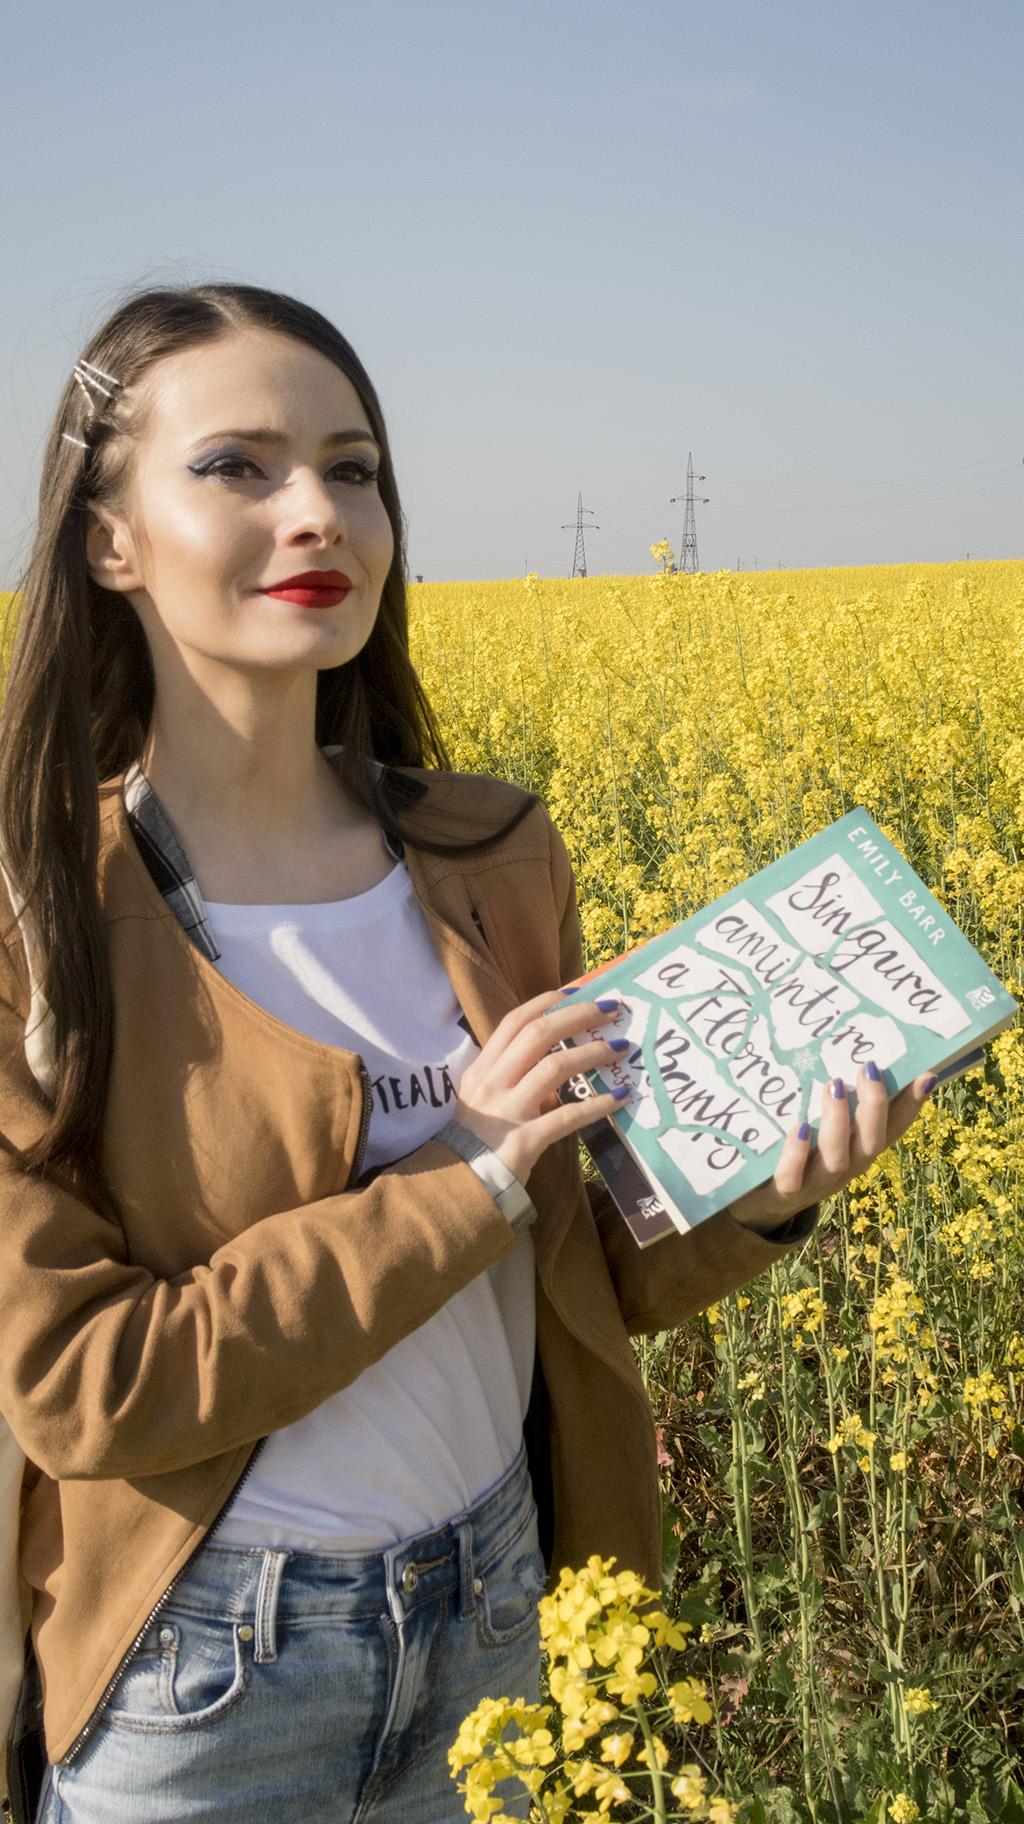 carti epica sub soarele noptii girl online zoe sugg singura amintire a florei banks